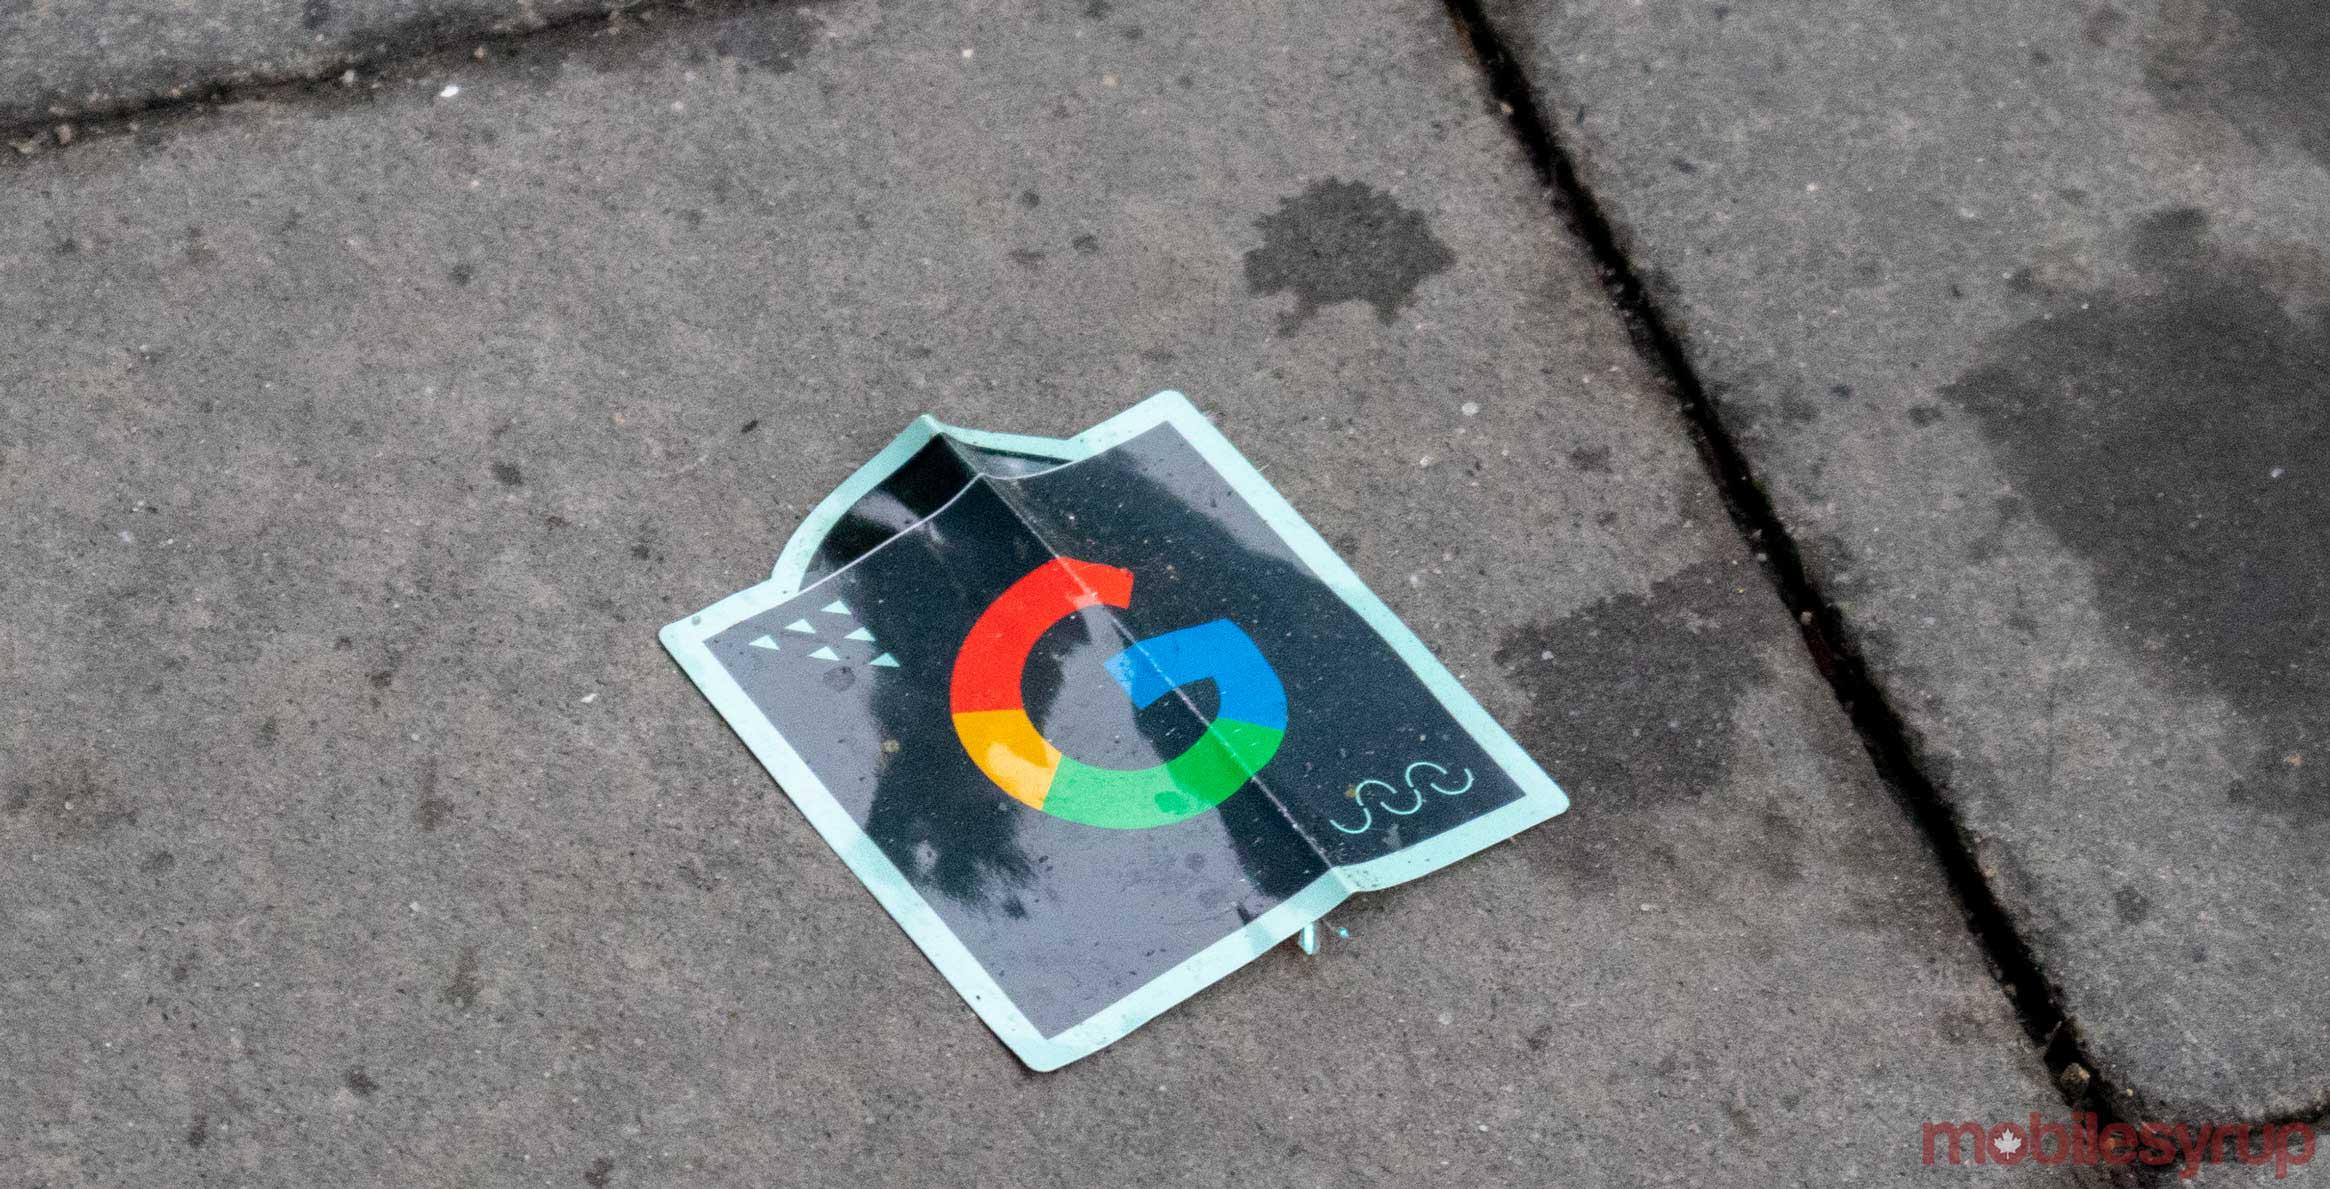 Google Plus will shut down four months sooner than anticipated